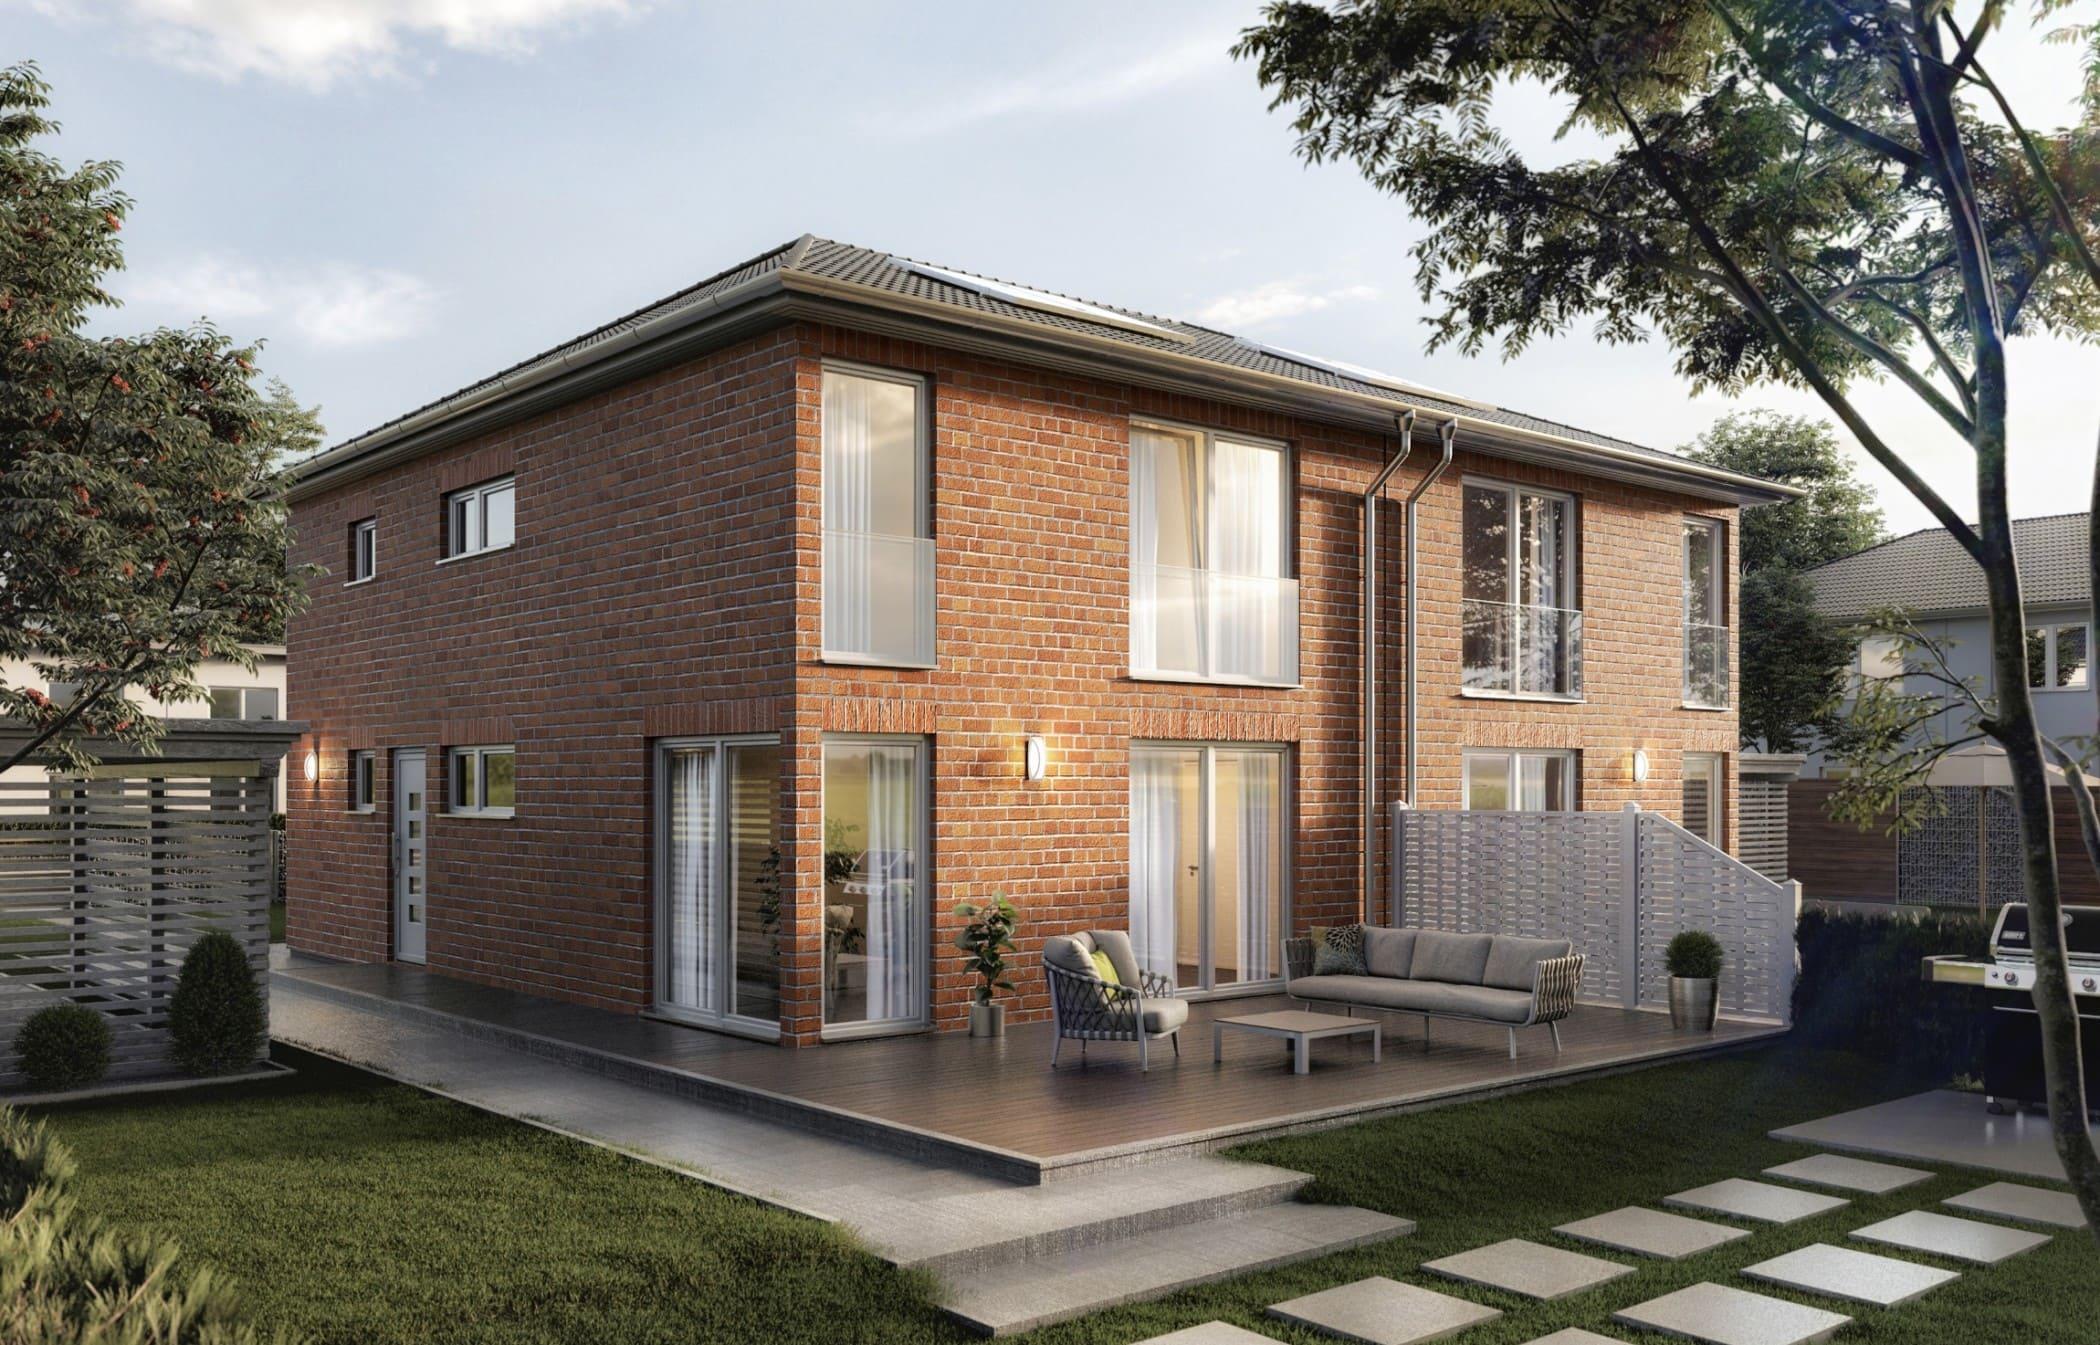 Doppelhaus modern mit Walmdach Architektur - Doppelhaushälfte schlüsselfertig bauen Ideen Town Country Haus AURA 136 KLINKER Fassade Limnaeus Betula - HausbauDirekt.de